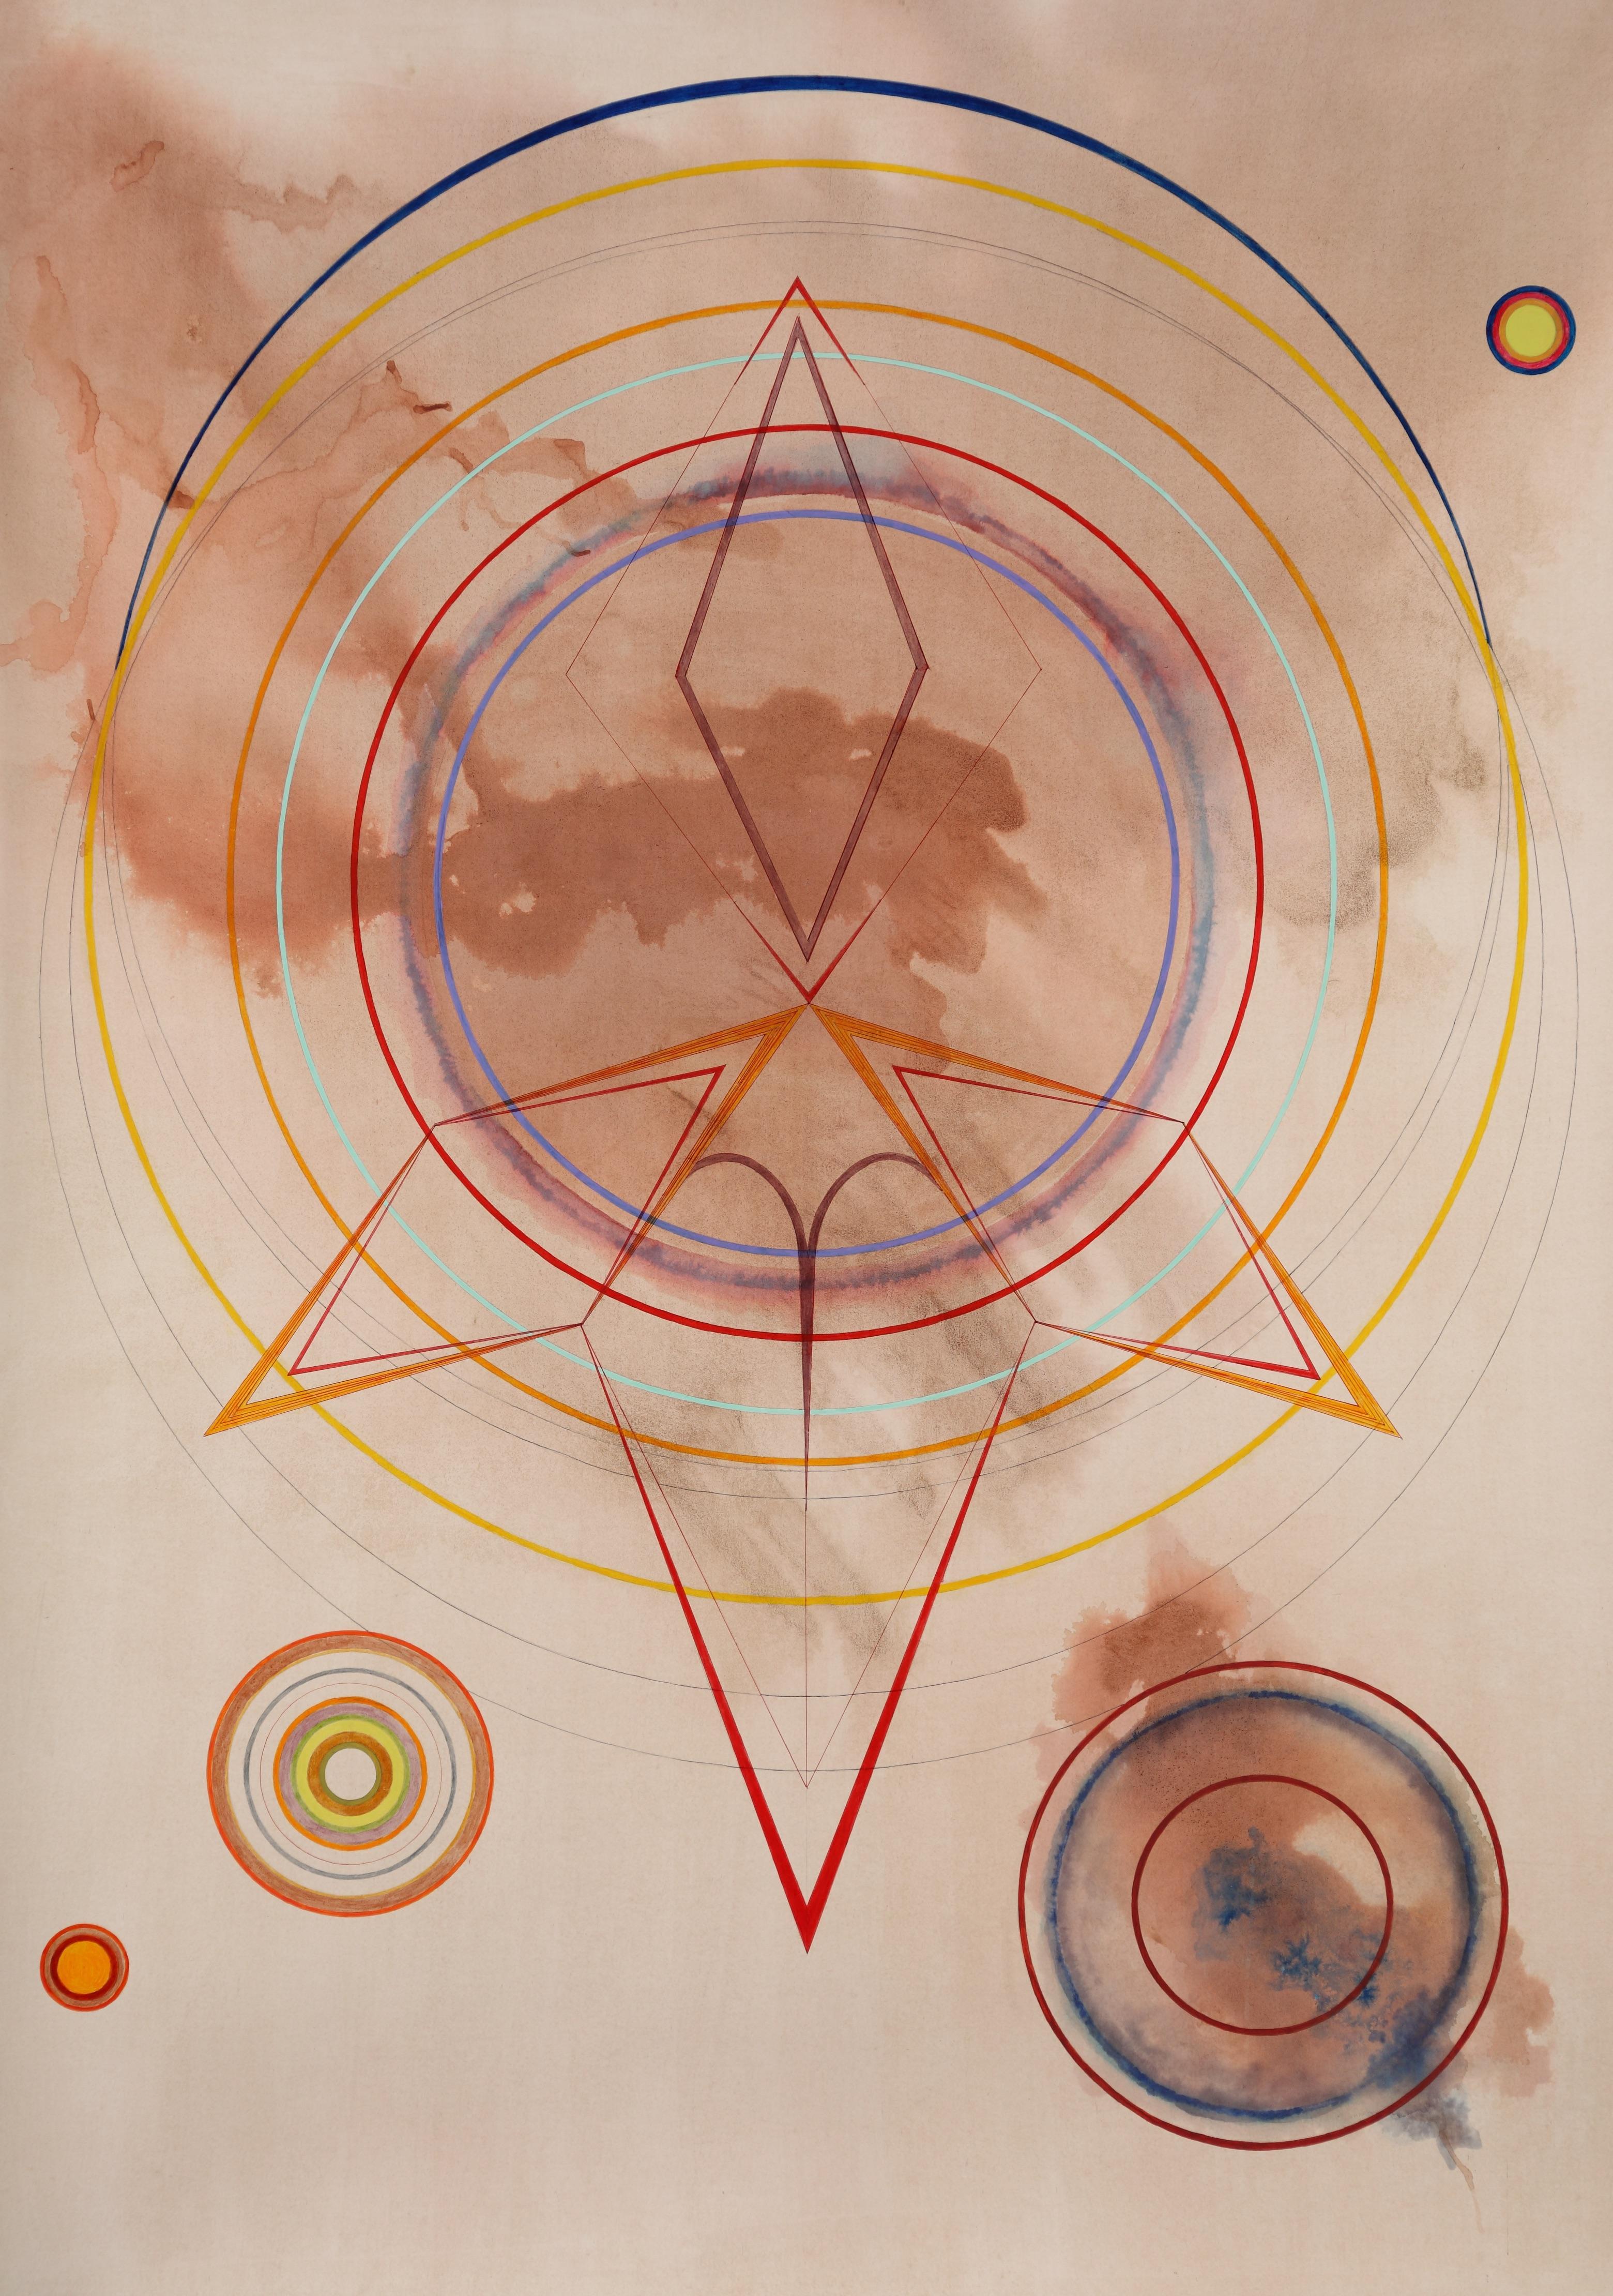 Tayo Heuser, Nomad, 2013, Ink on handburnished paper, Abstraction, Meditative